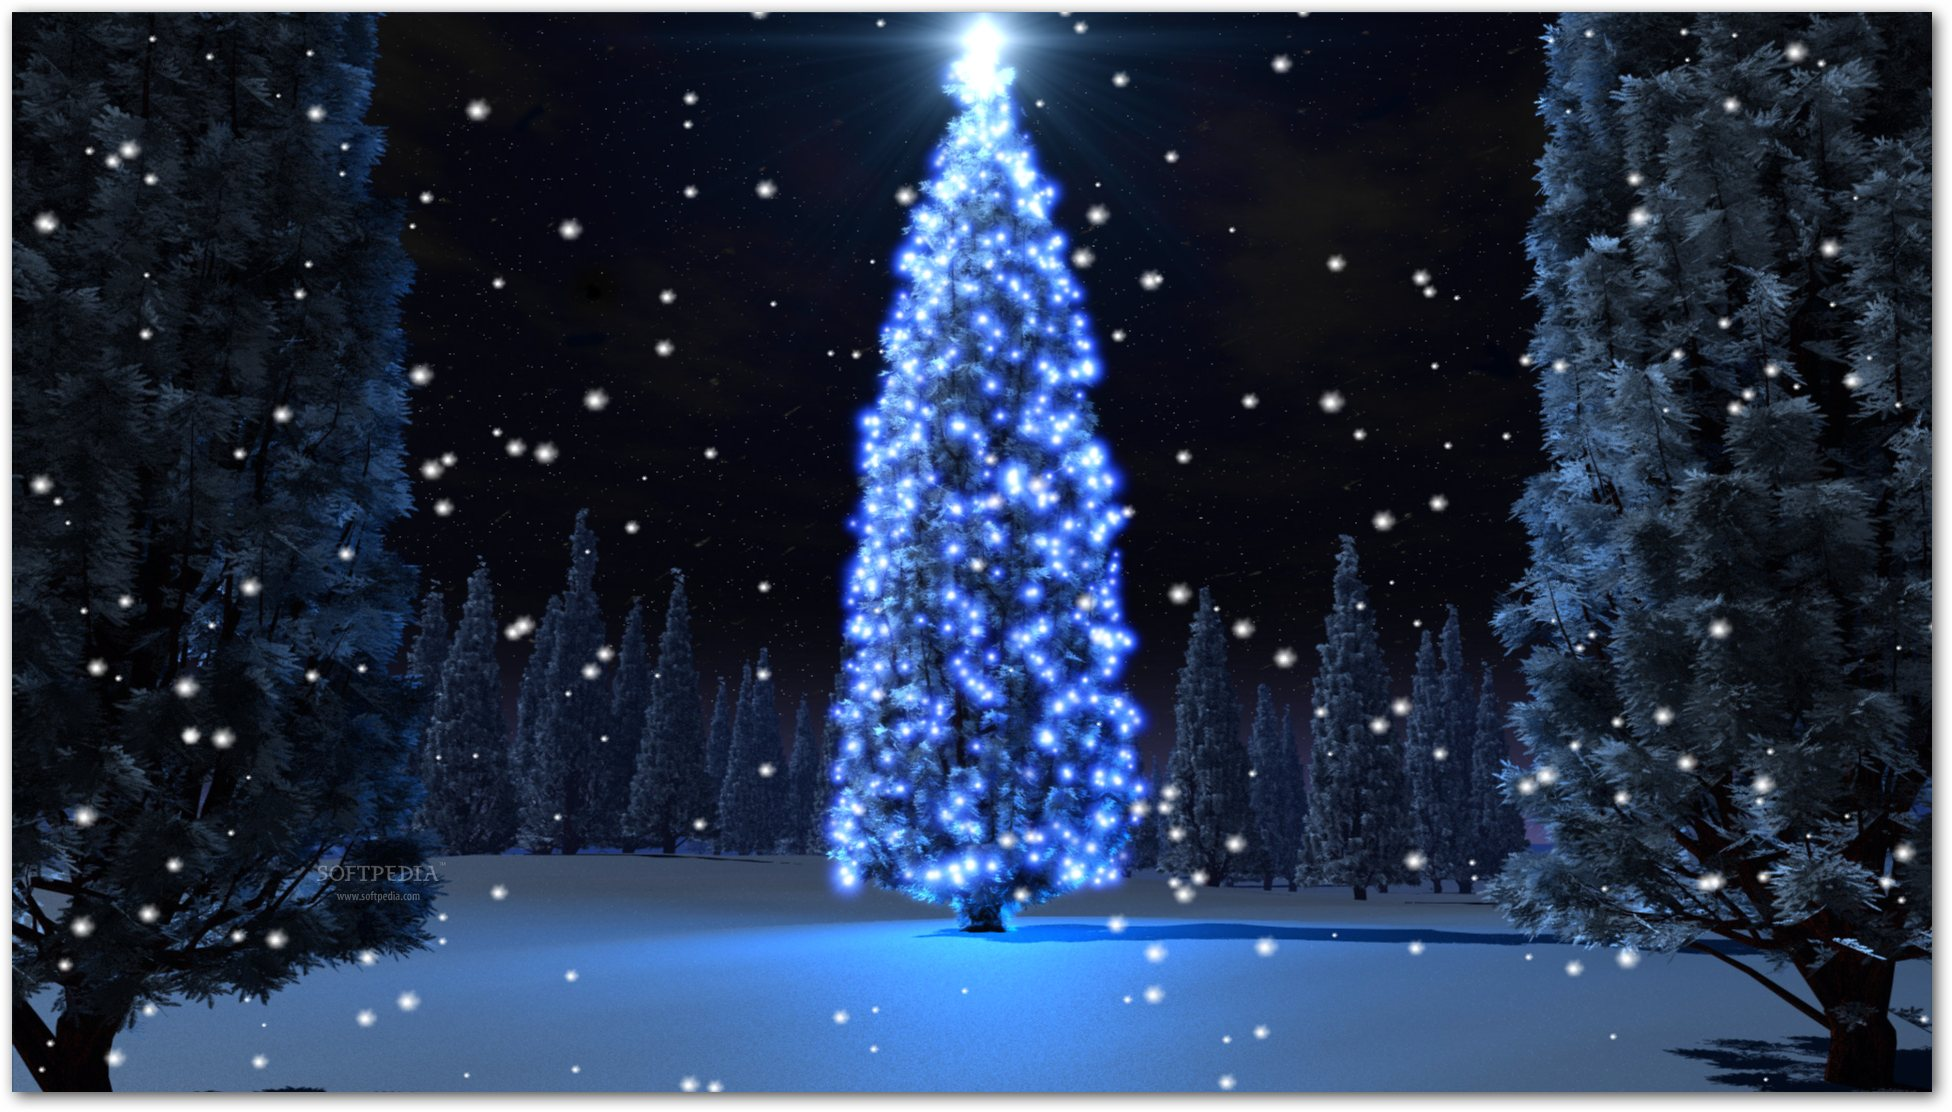 Holiday Tree Screensaver Screenshots 1952x1112